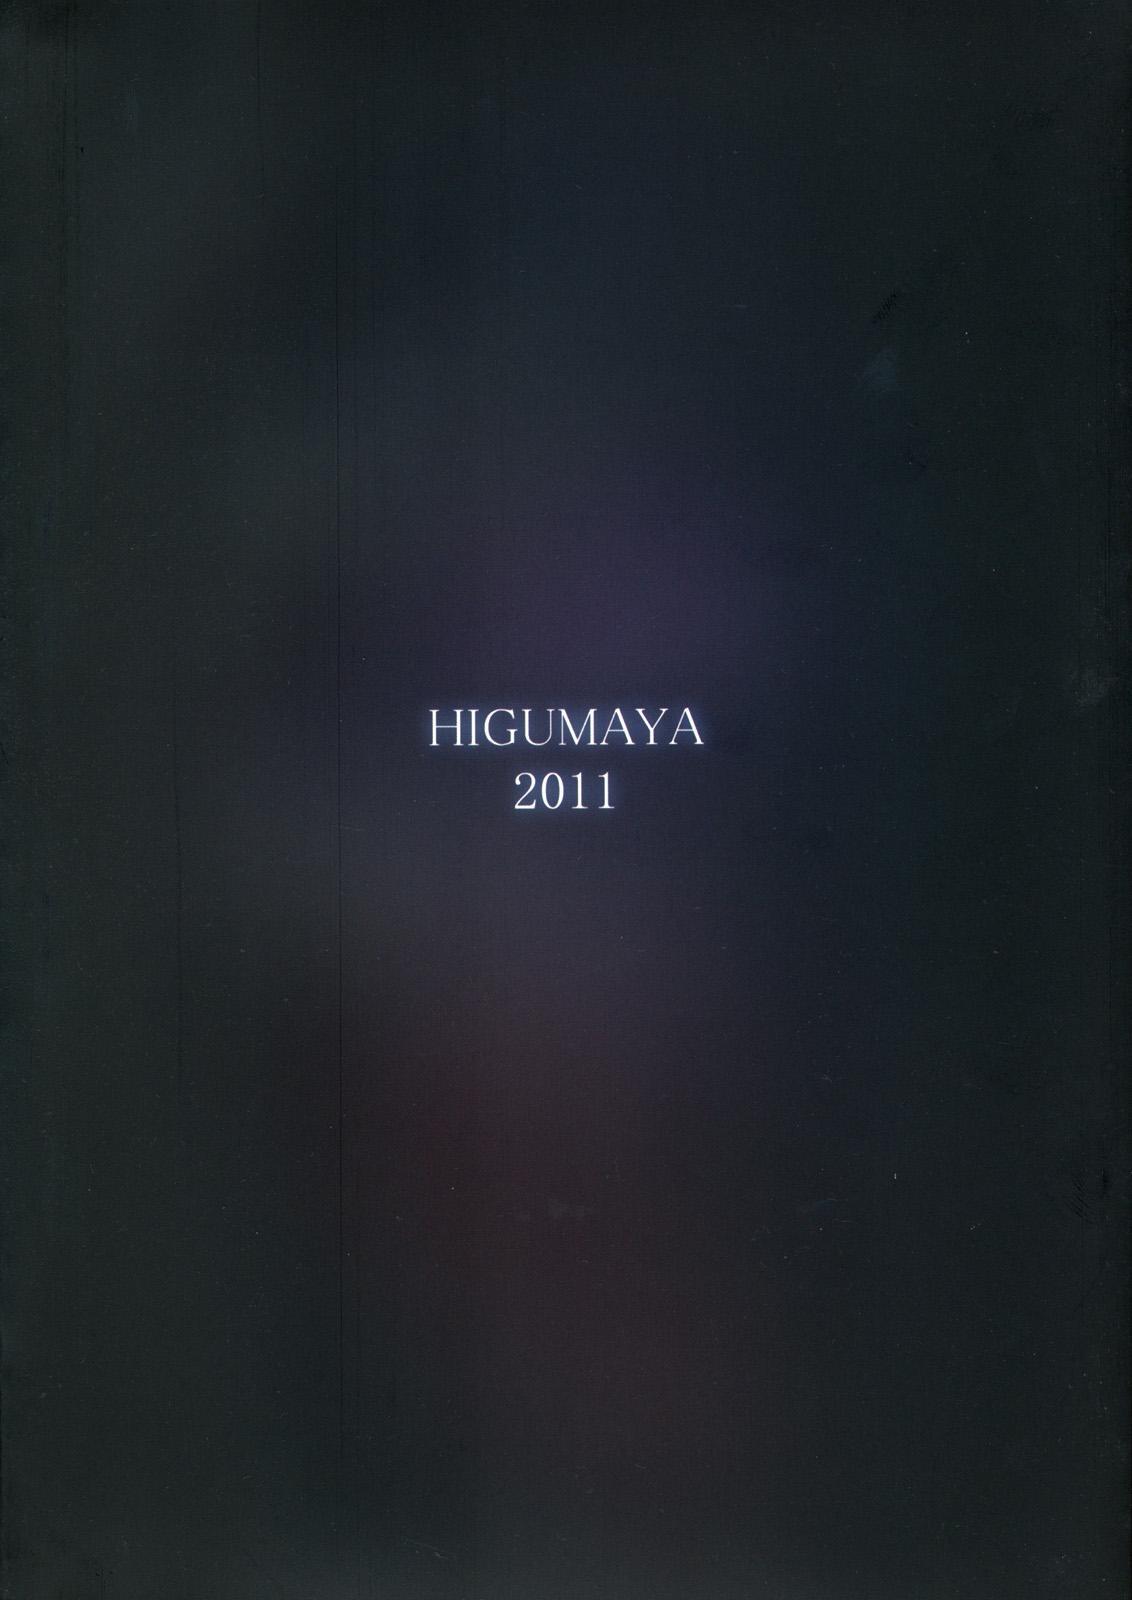 (C81) [Higuma-ya (Nora Higuma)] Nami-san ga! | Nami-san is! (One Piece) [English] {doujin-moe.us} 29